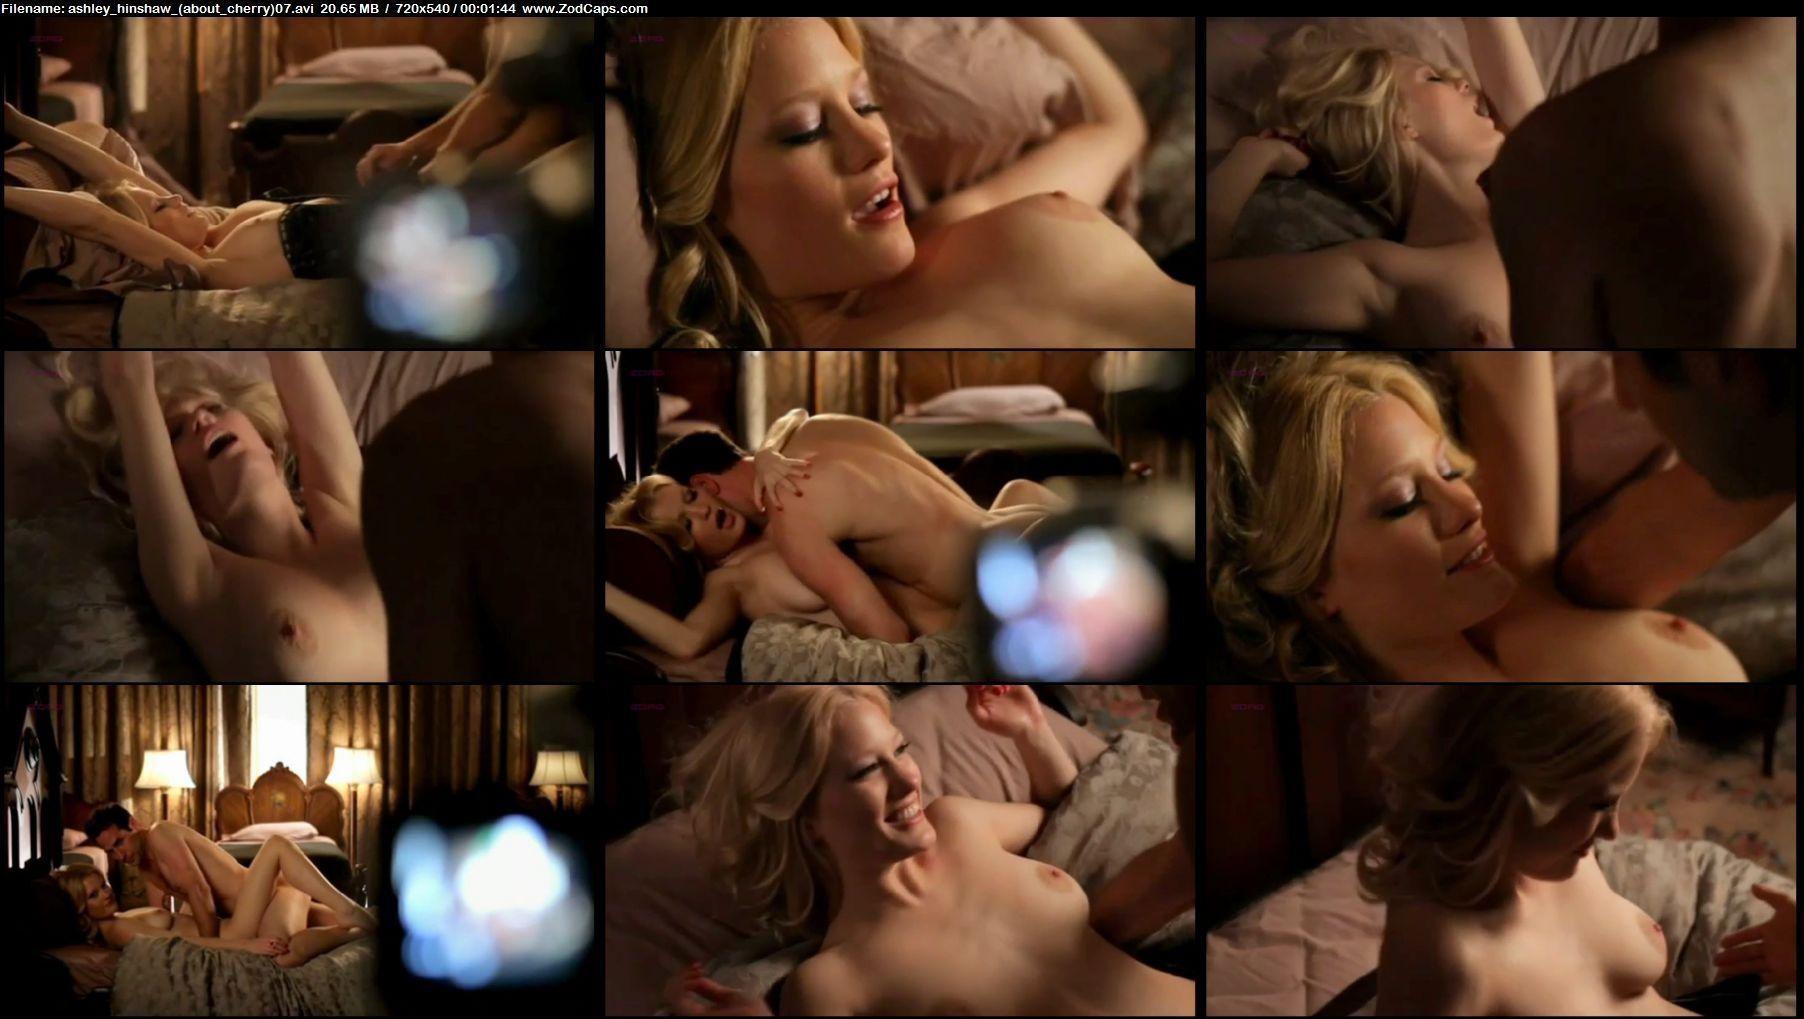 Ashley Hinshaw In Sex Scene